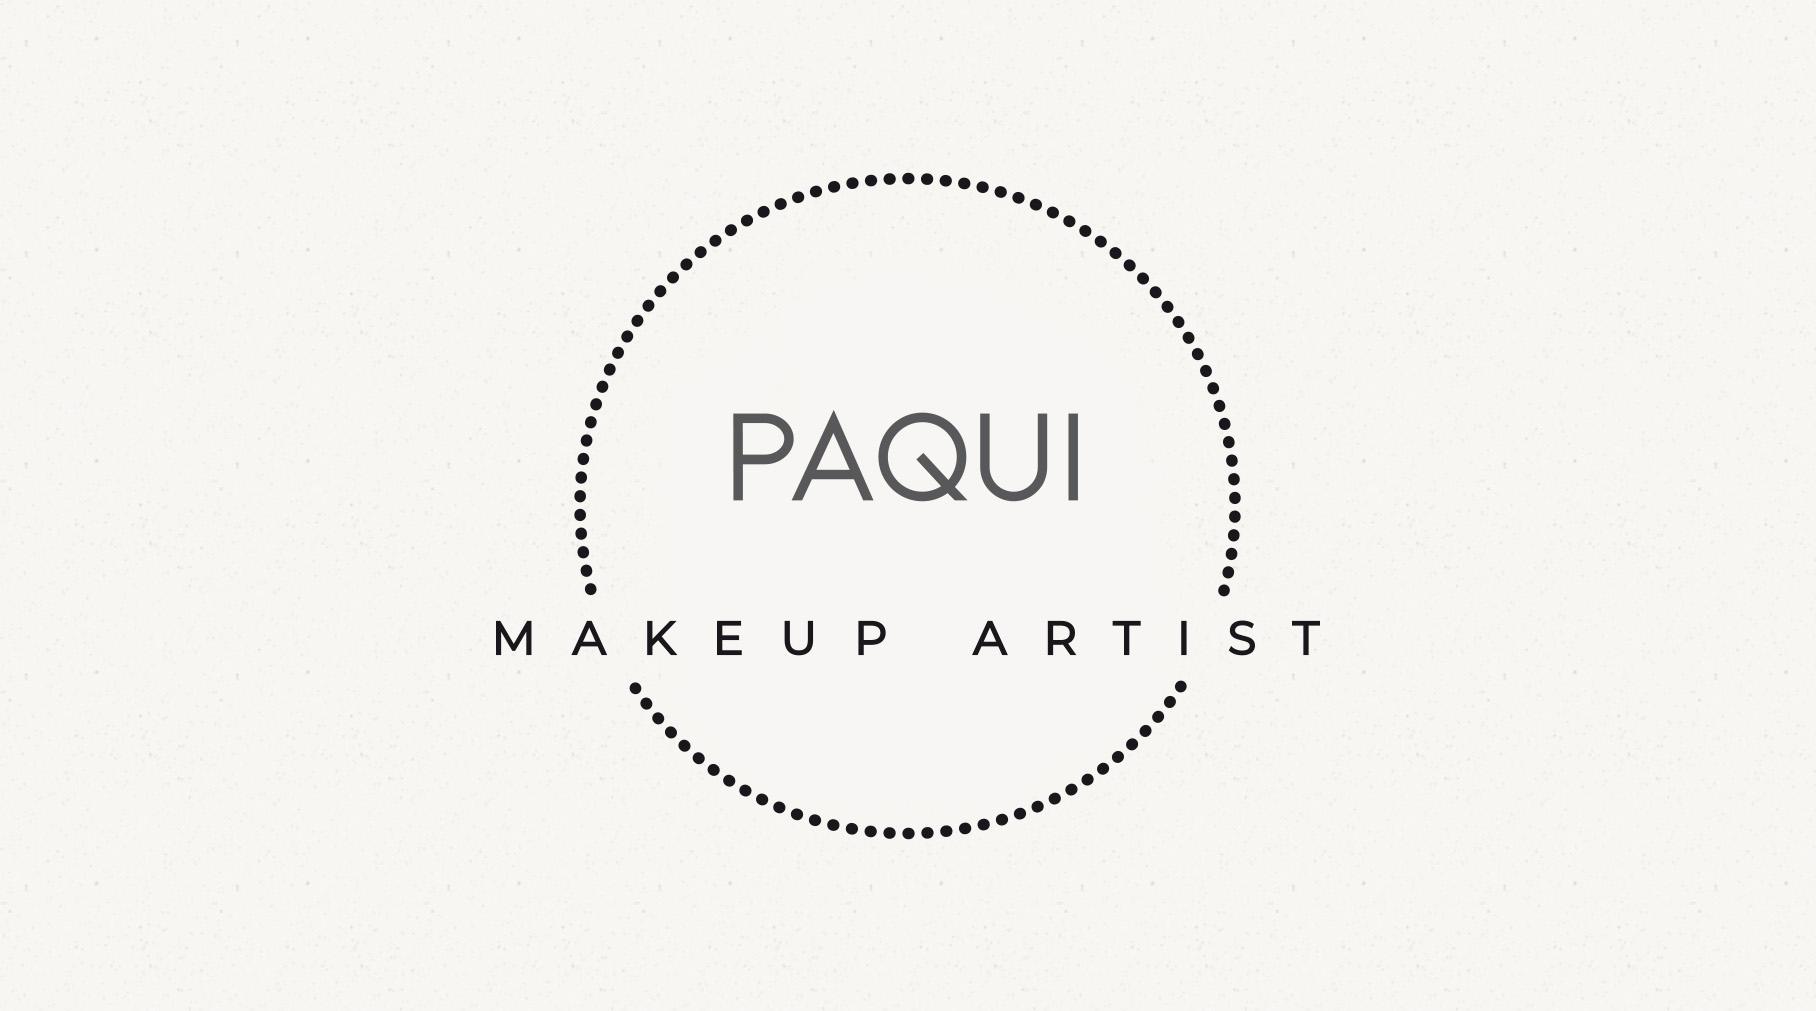 Paqui Makeup Artist - Diseño imagen corporativa